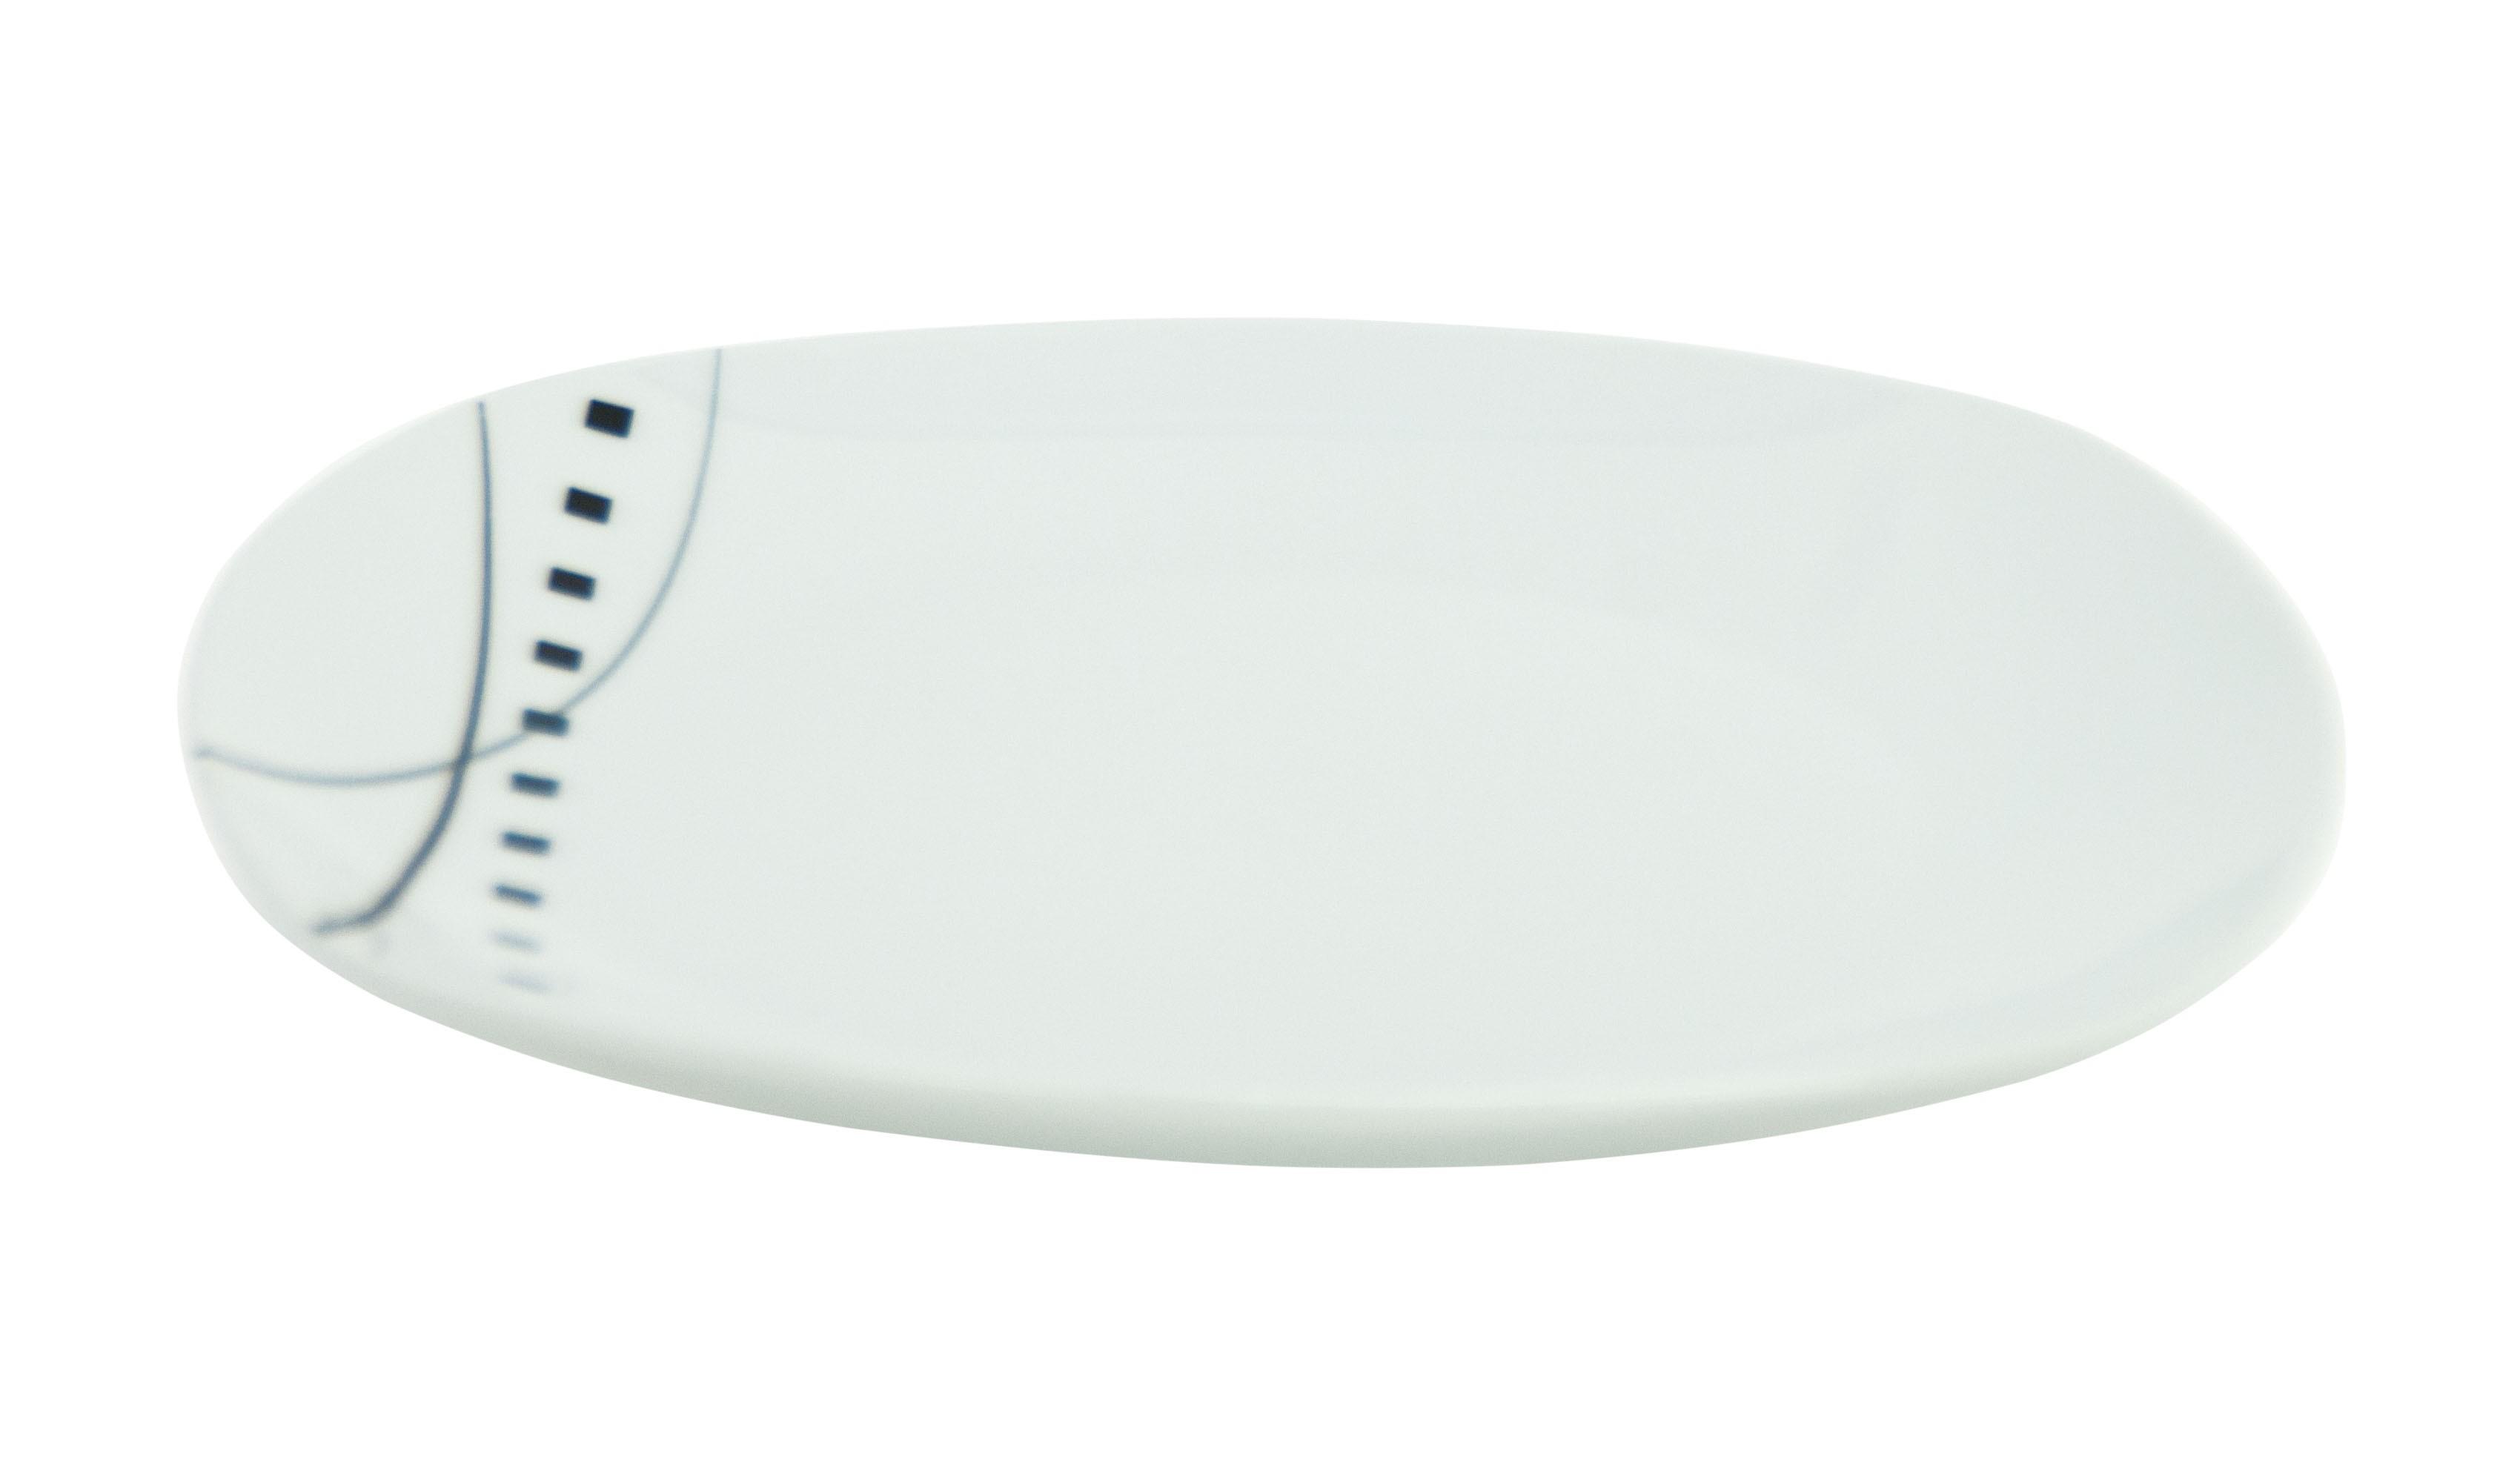 tafelservice iowa 30tlg wei mit farbigem dekor f r 6. Black Bedroom Furniture Sets. Home Design Ideas